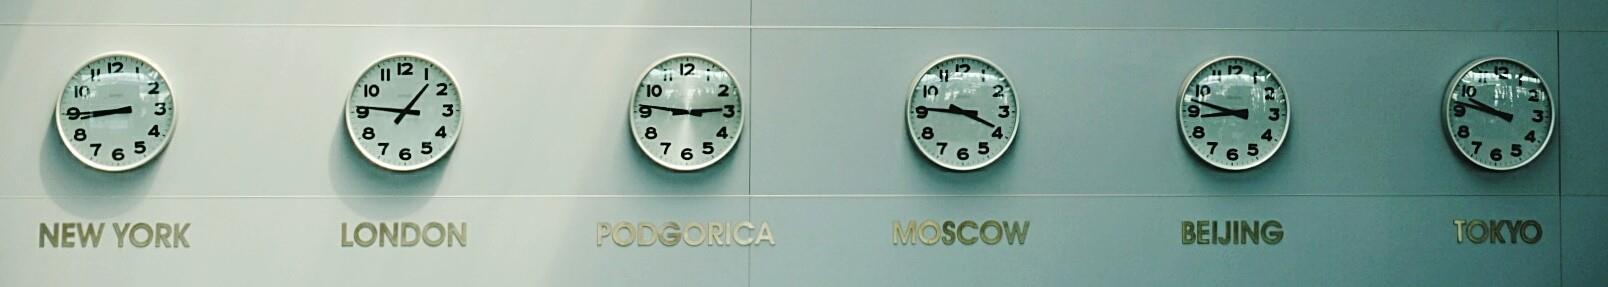 networking-world-clocks